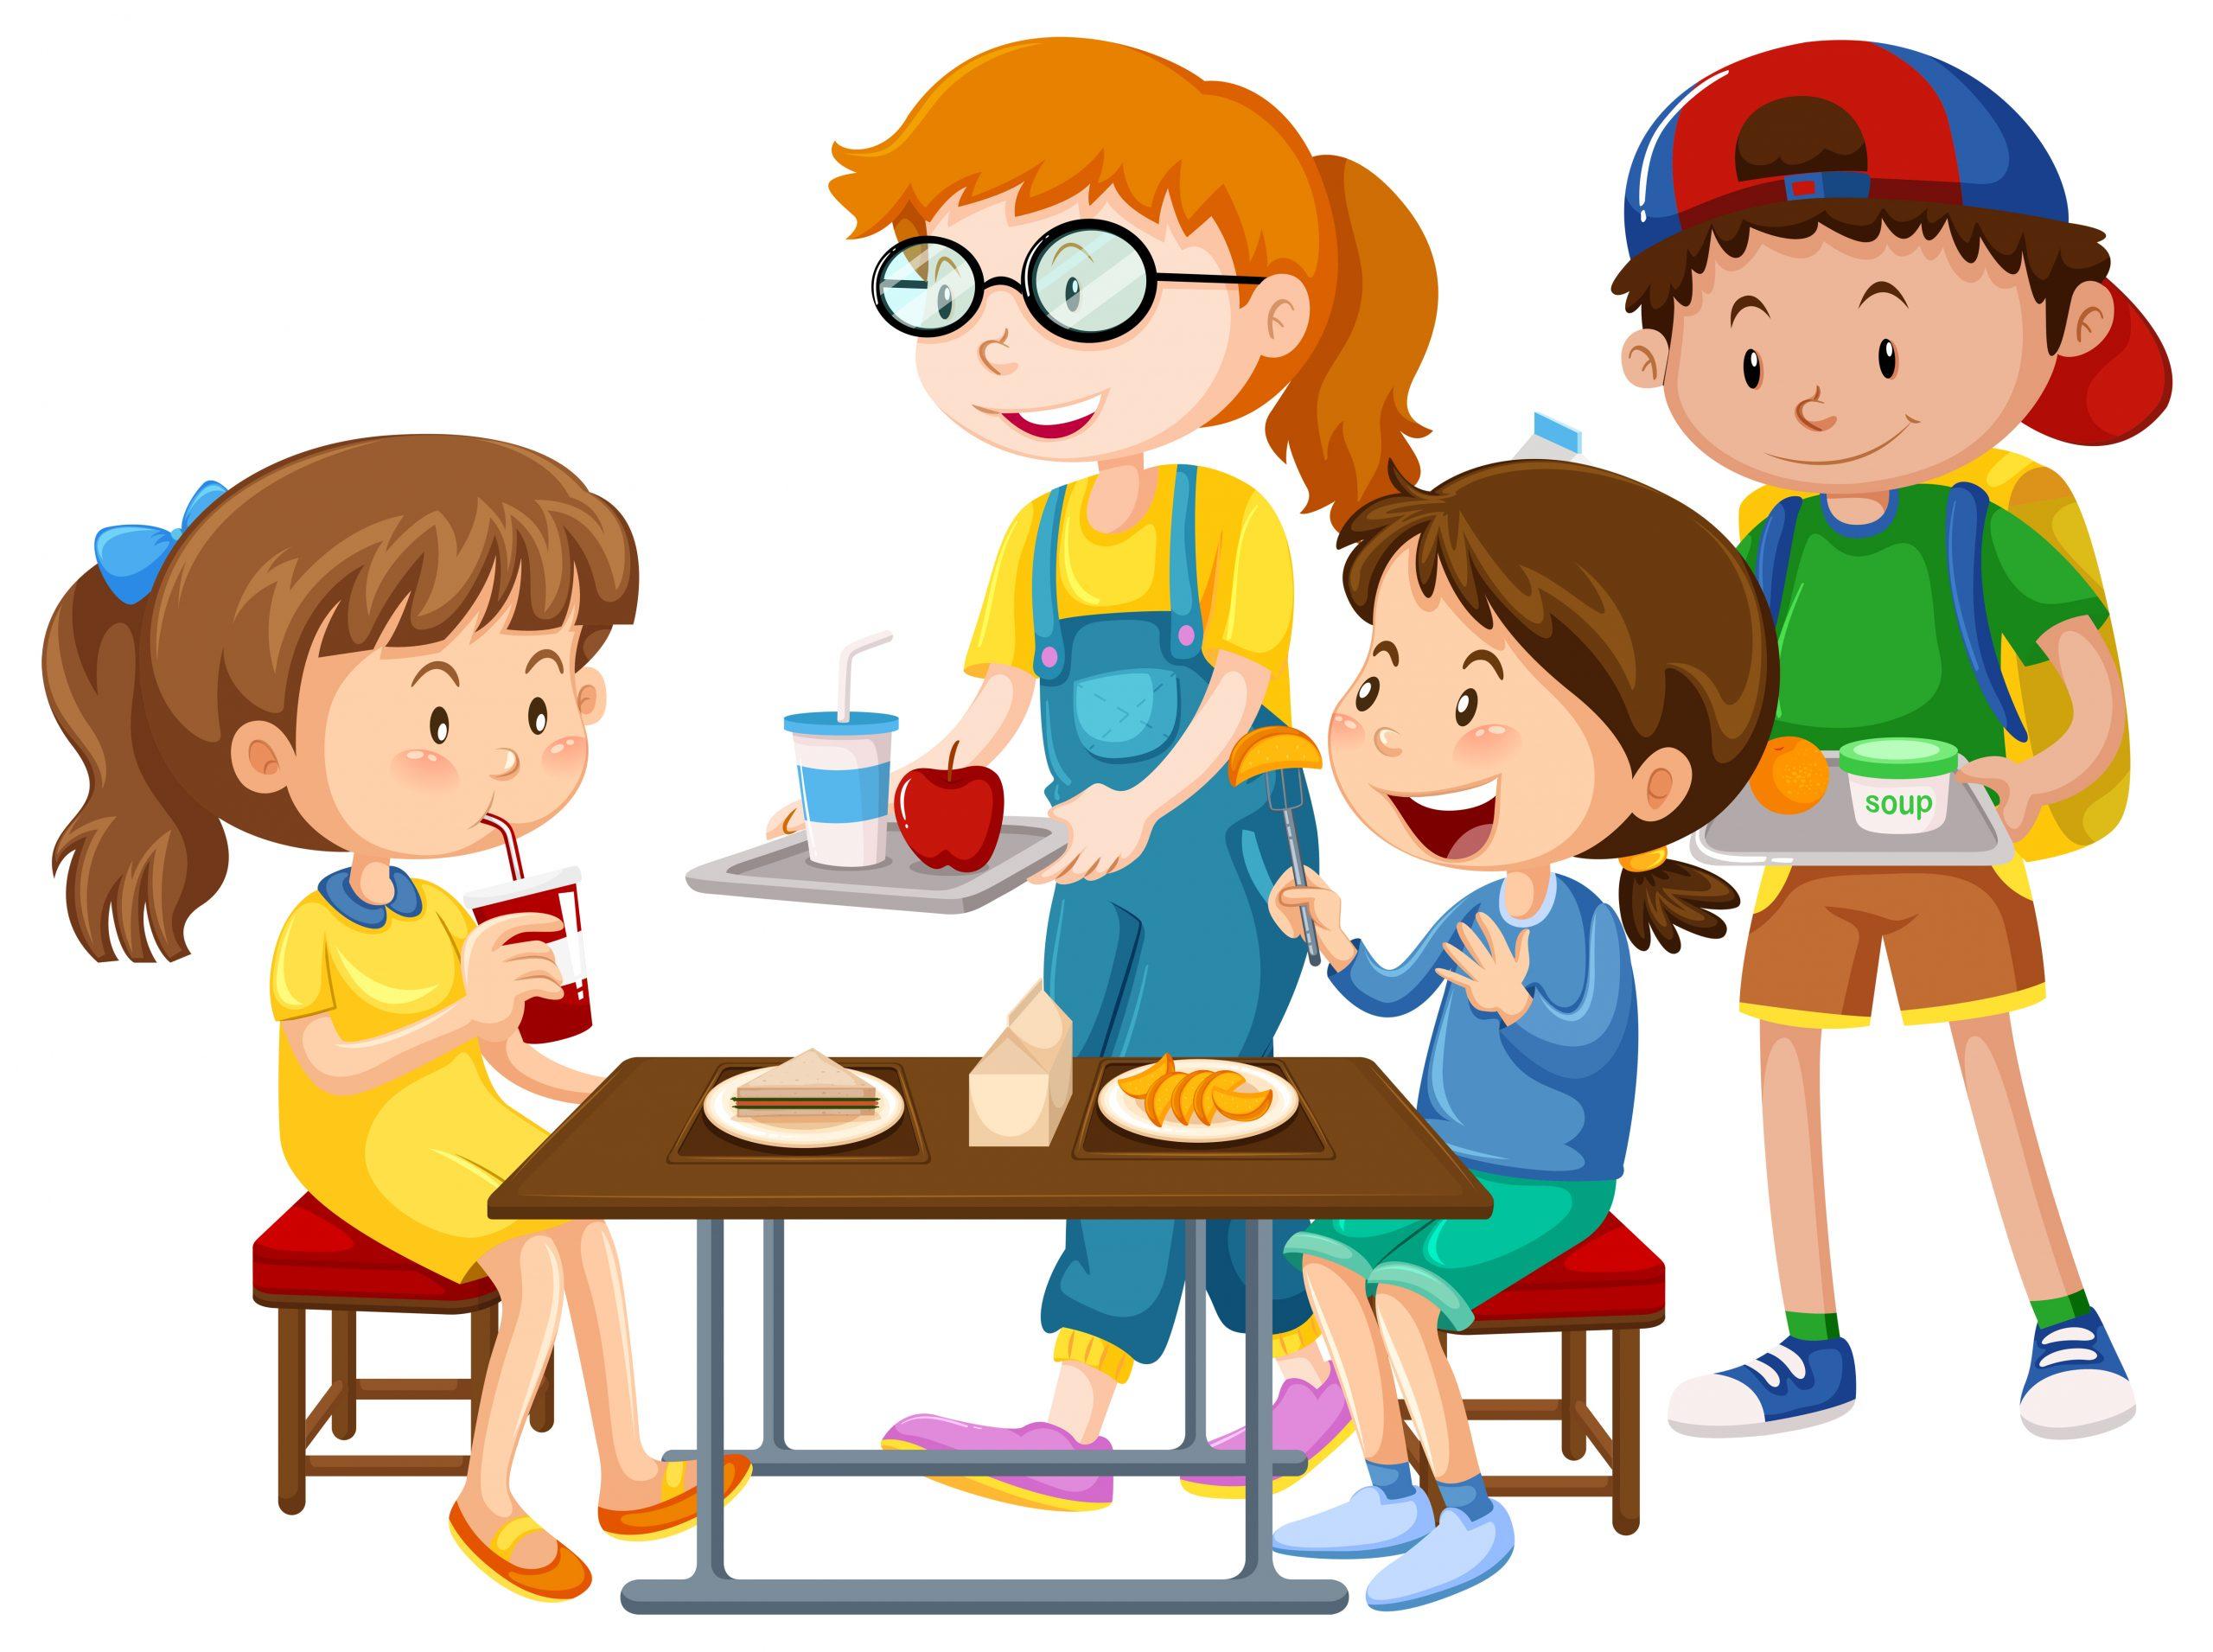 Children having meal at table illustration